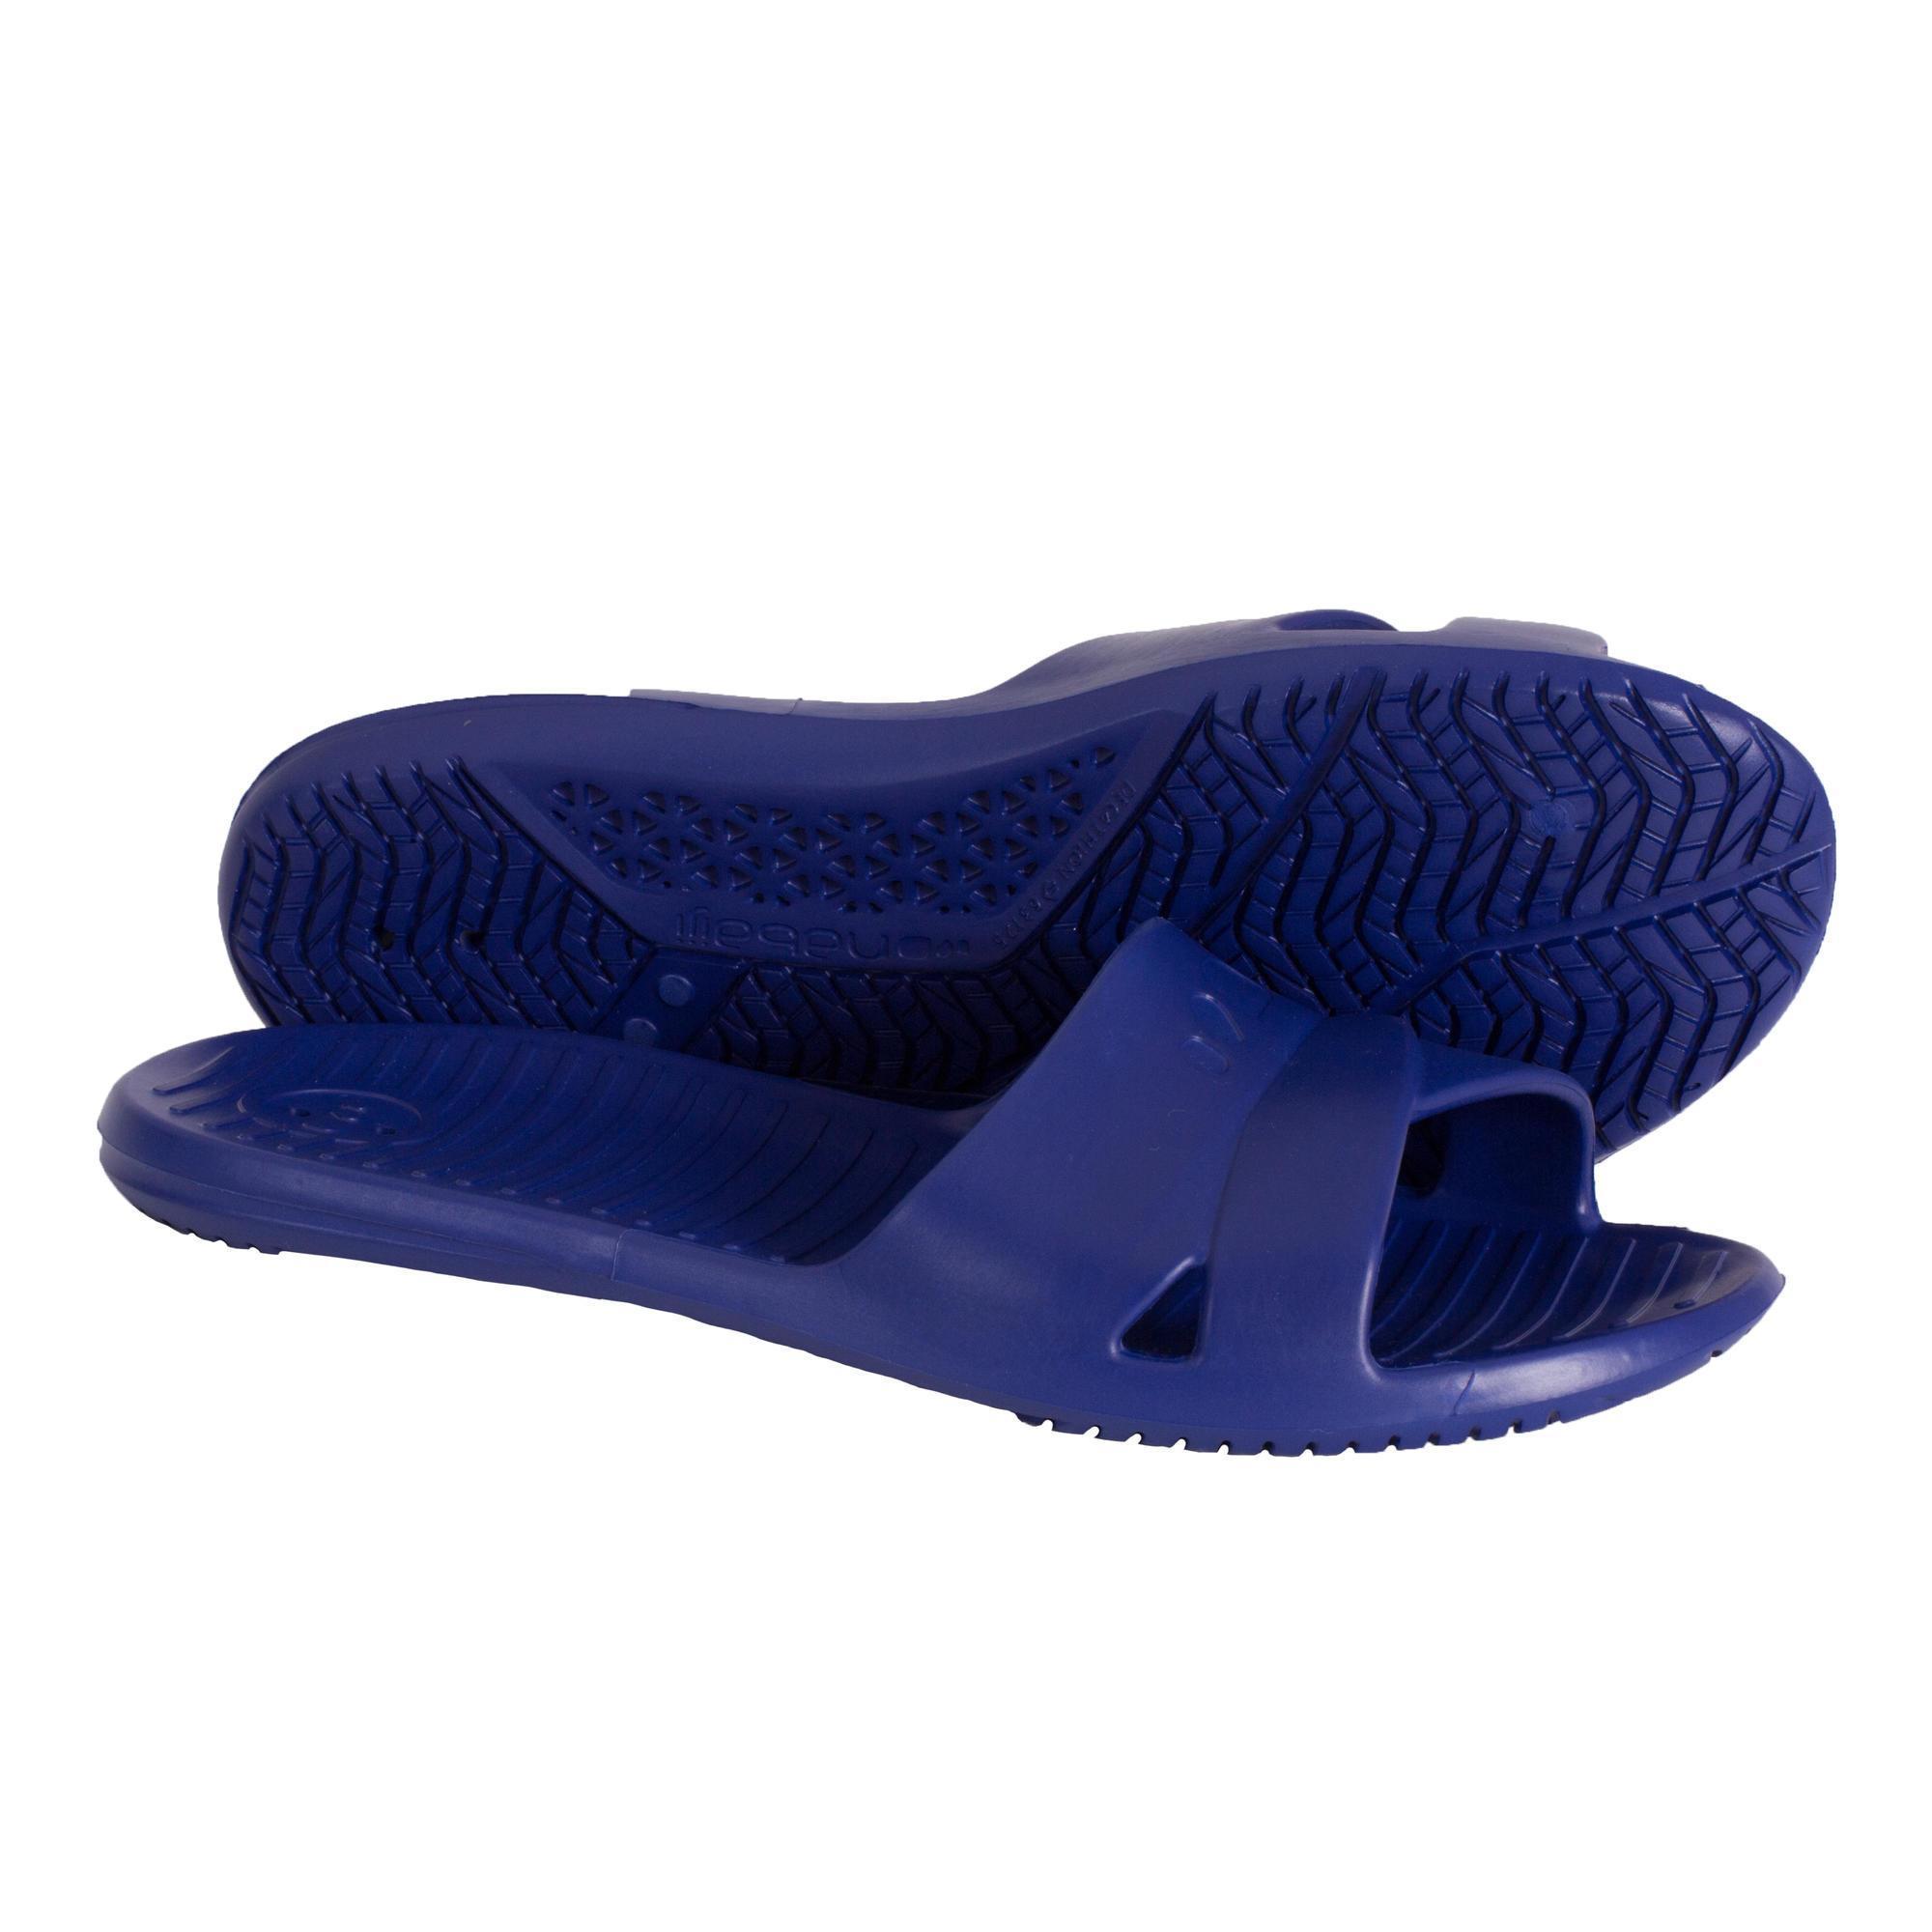 Sandales De Piscine Femme Slap 100 Basic Bleu Fonce concernant Sandales De Piscine